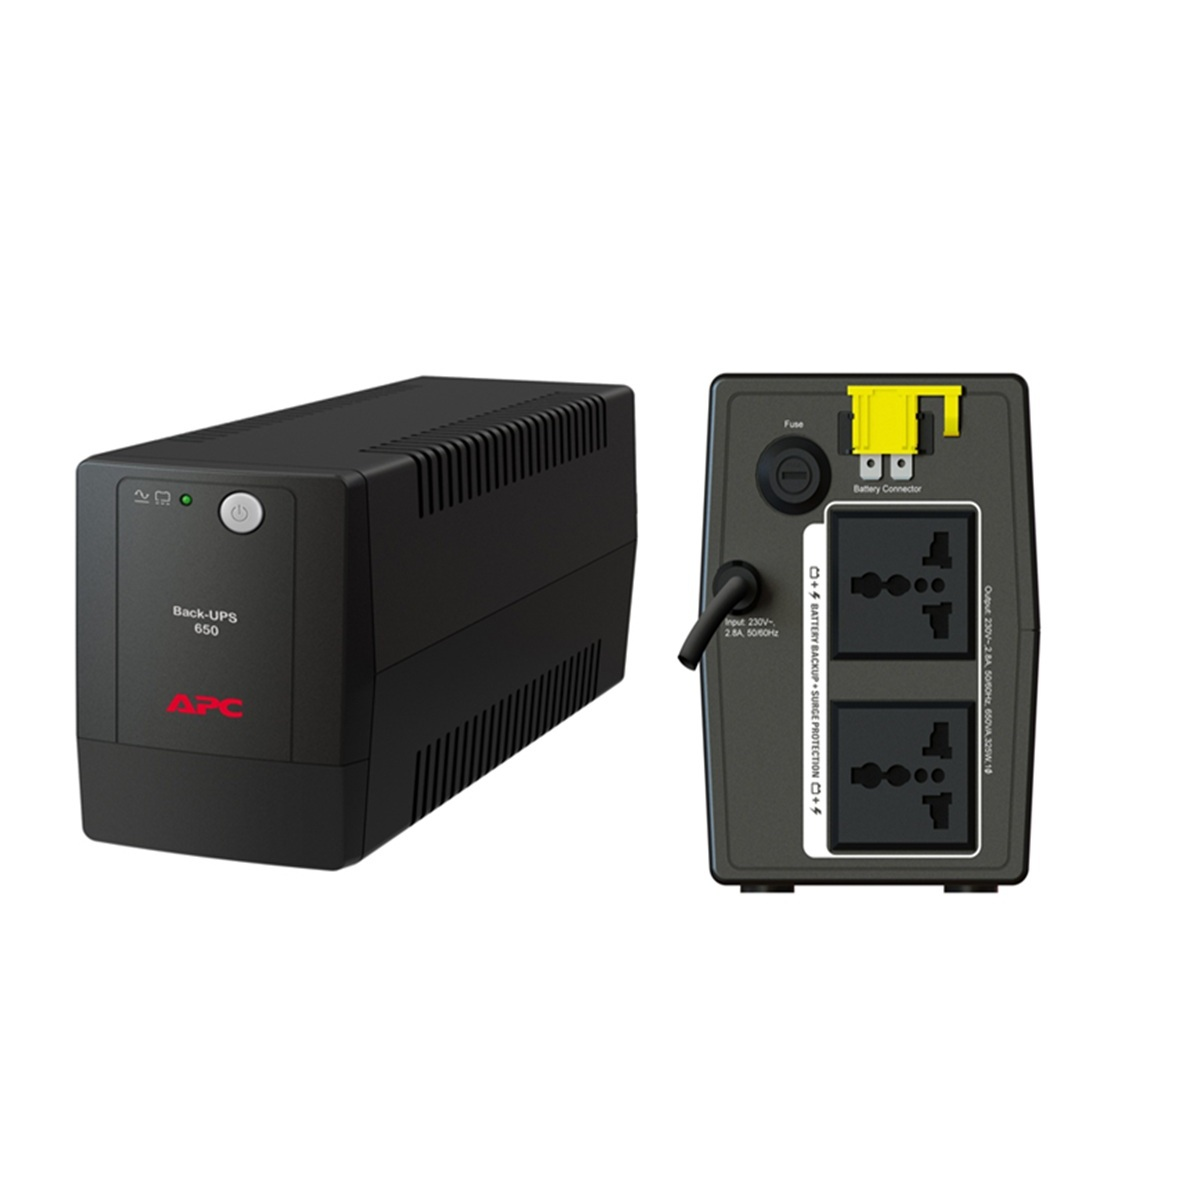 APC BACK-UPS 650VA (BX650LI-MS)